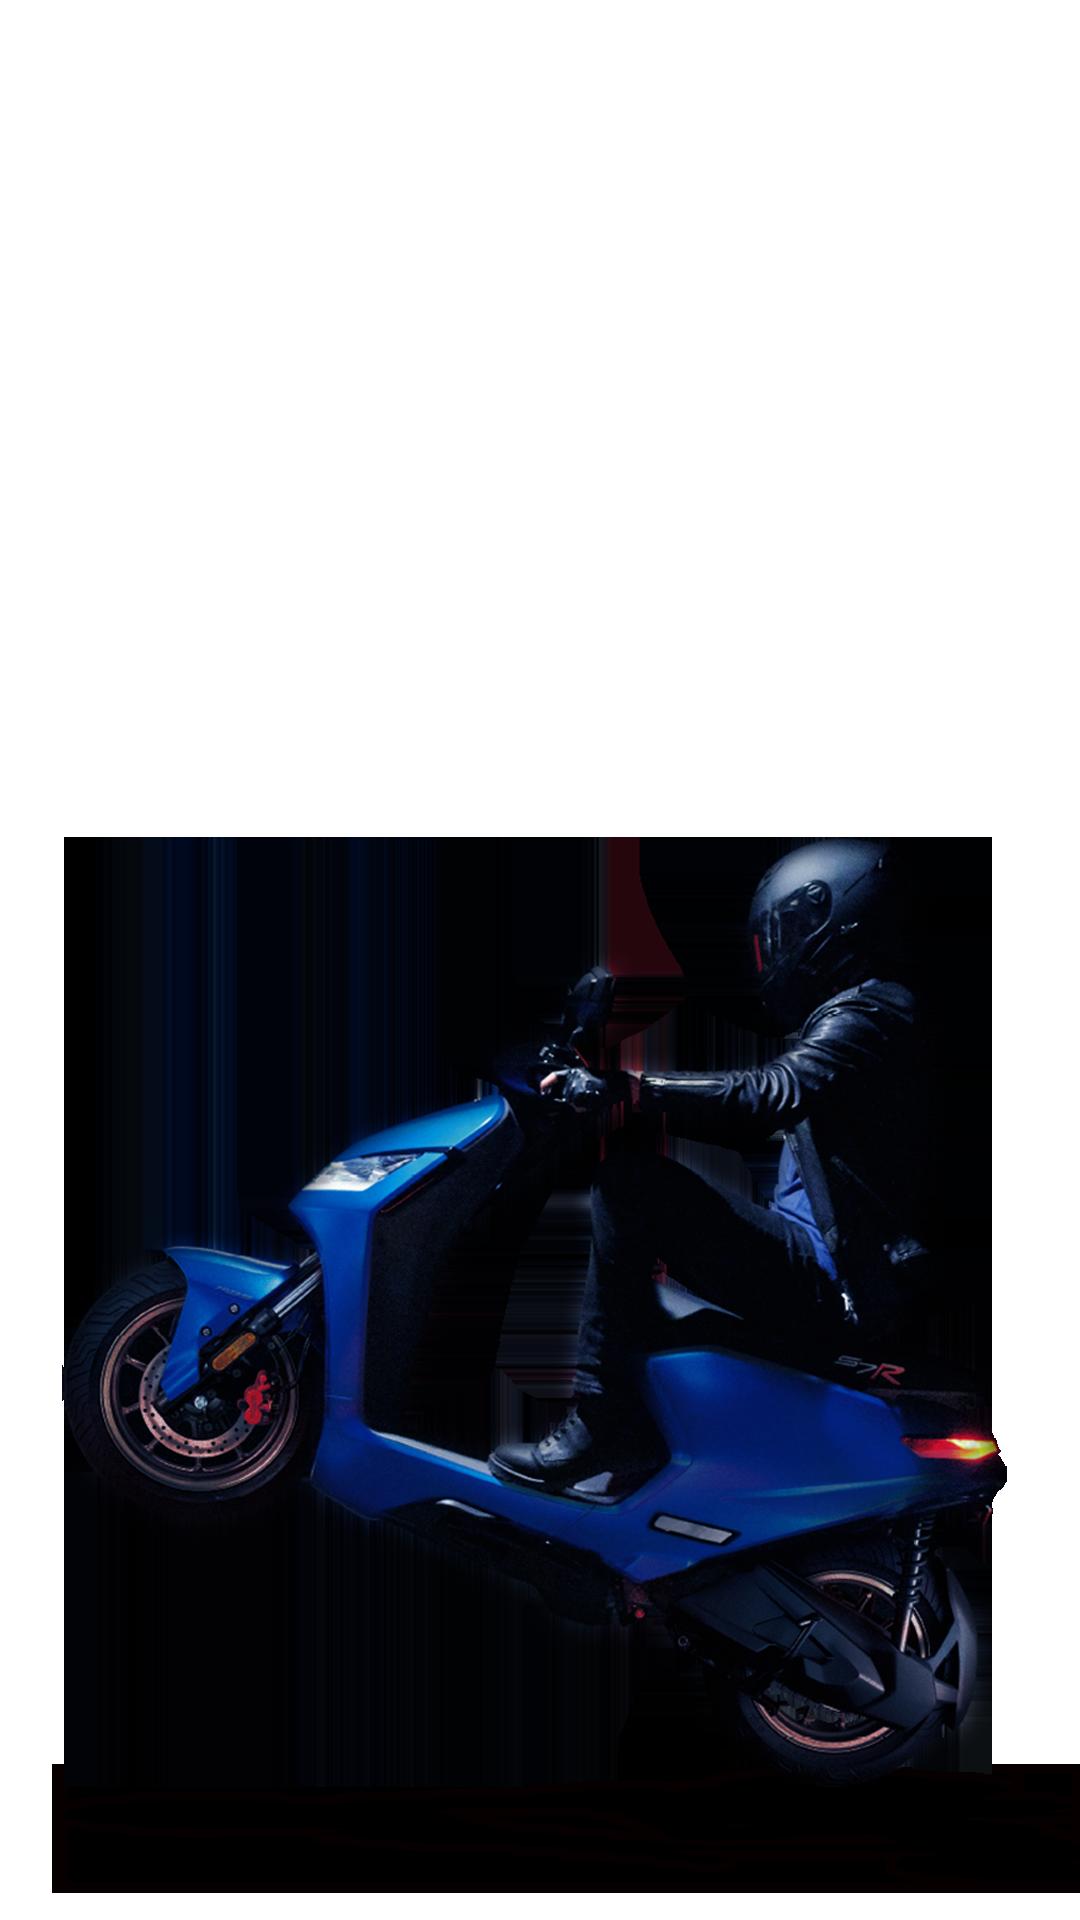 s7r-bike-mobile